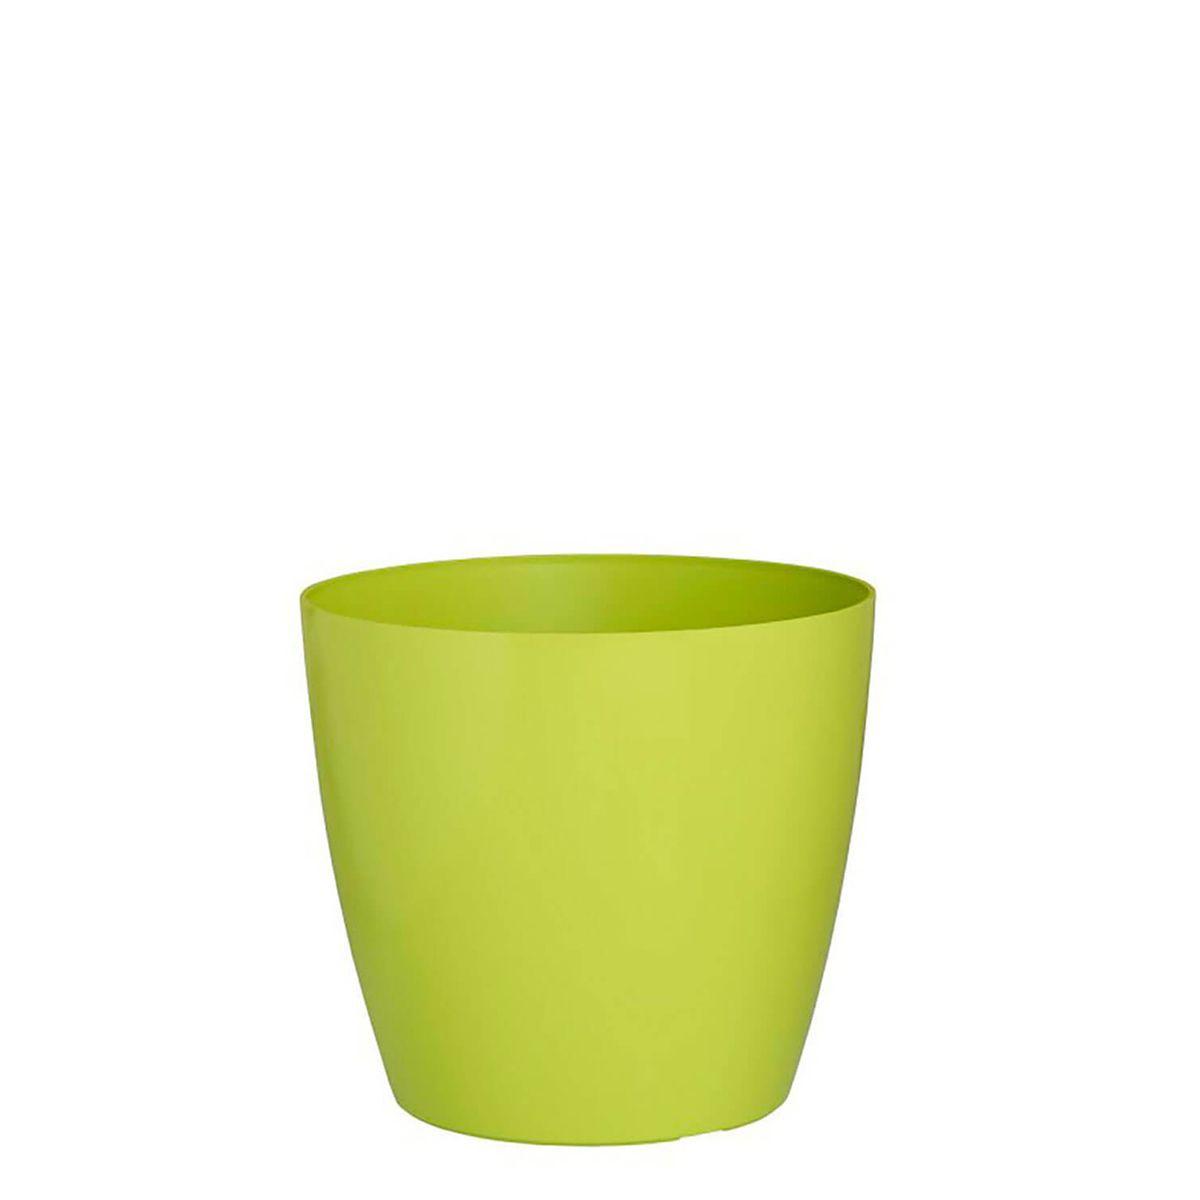 Vaso San Remo 12 x 11 cm Verde